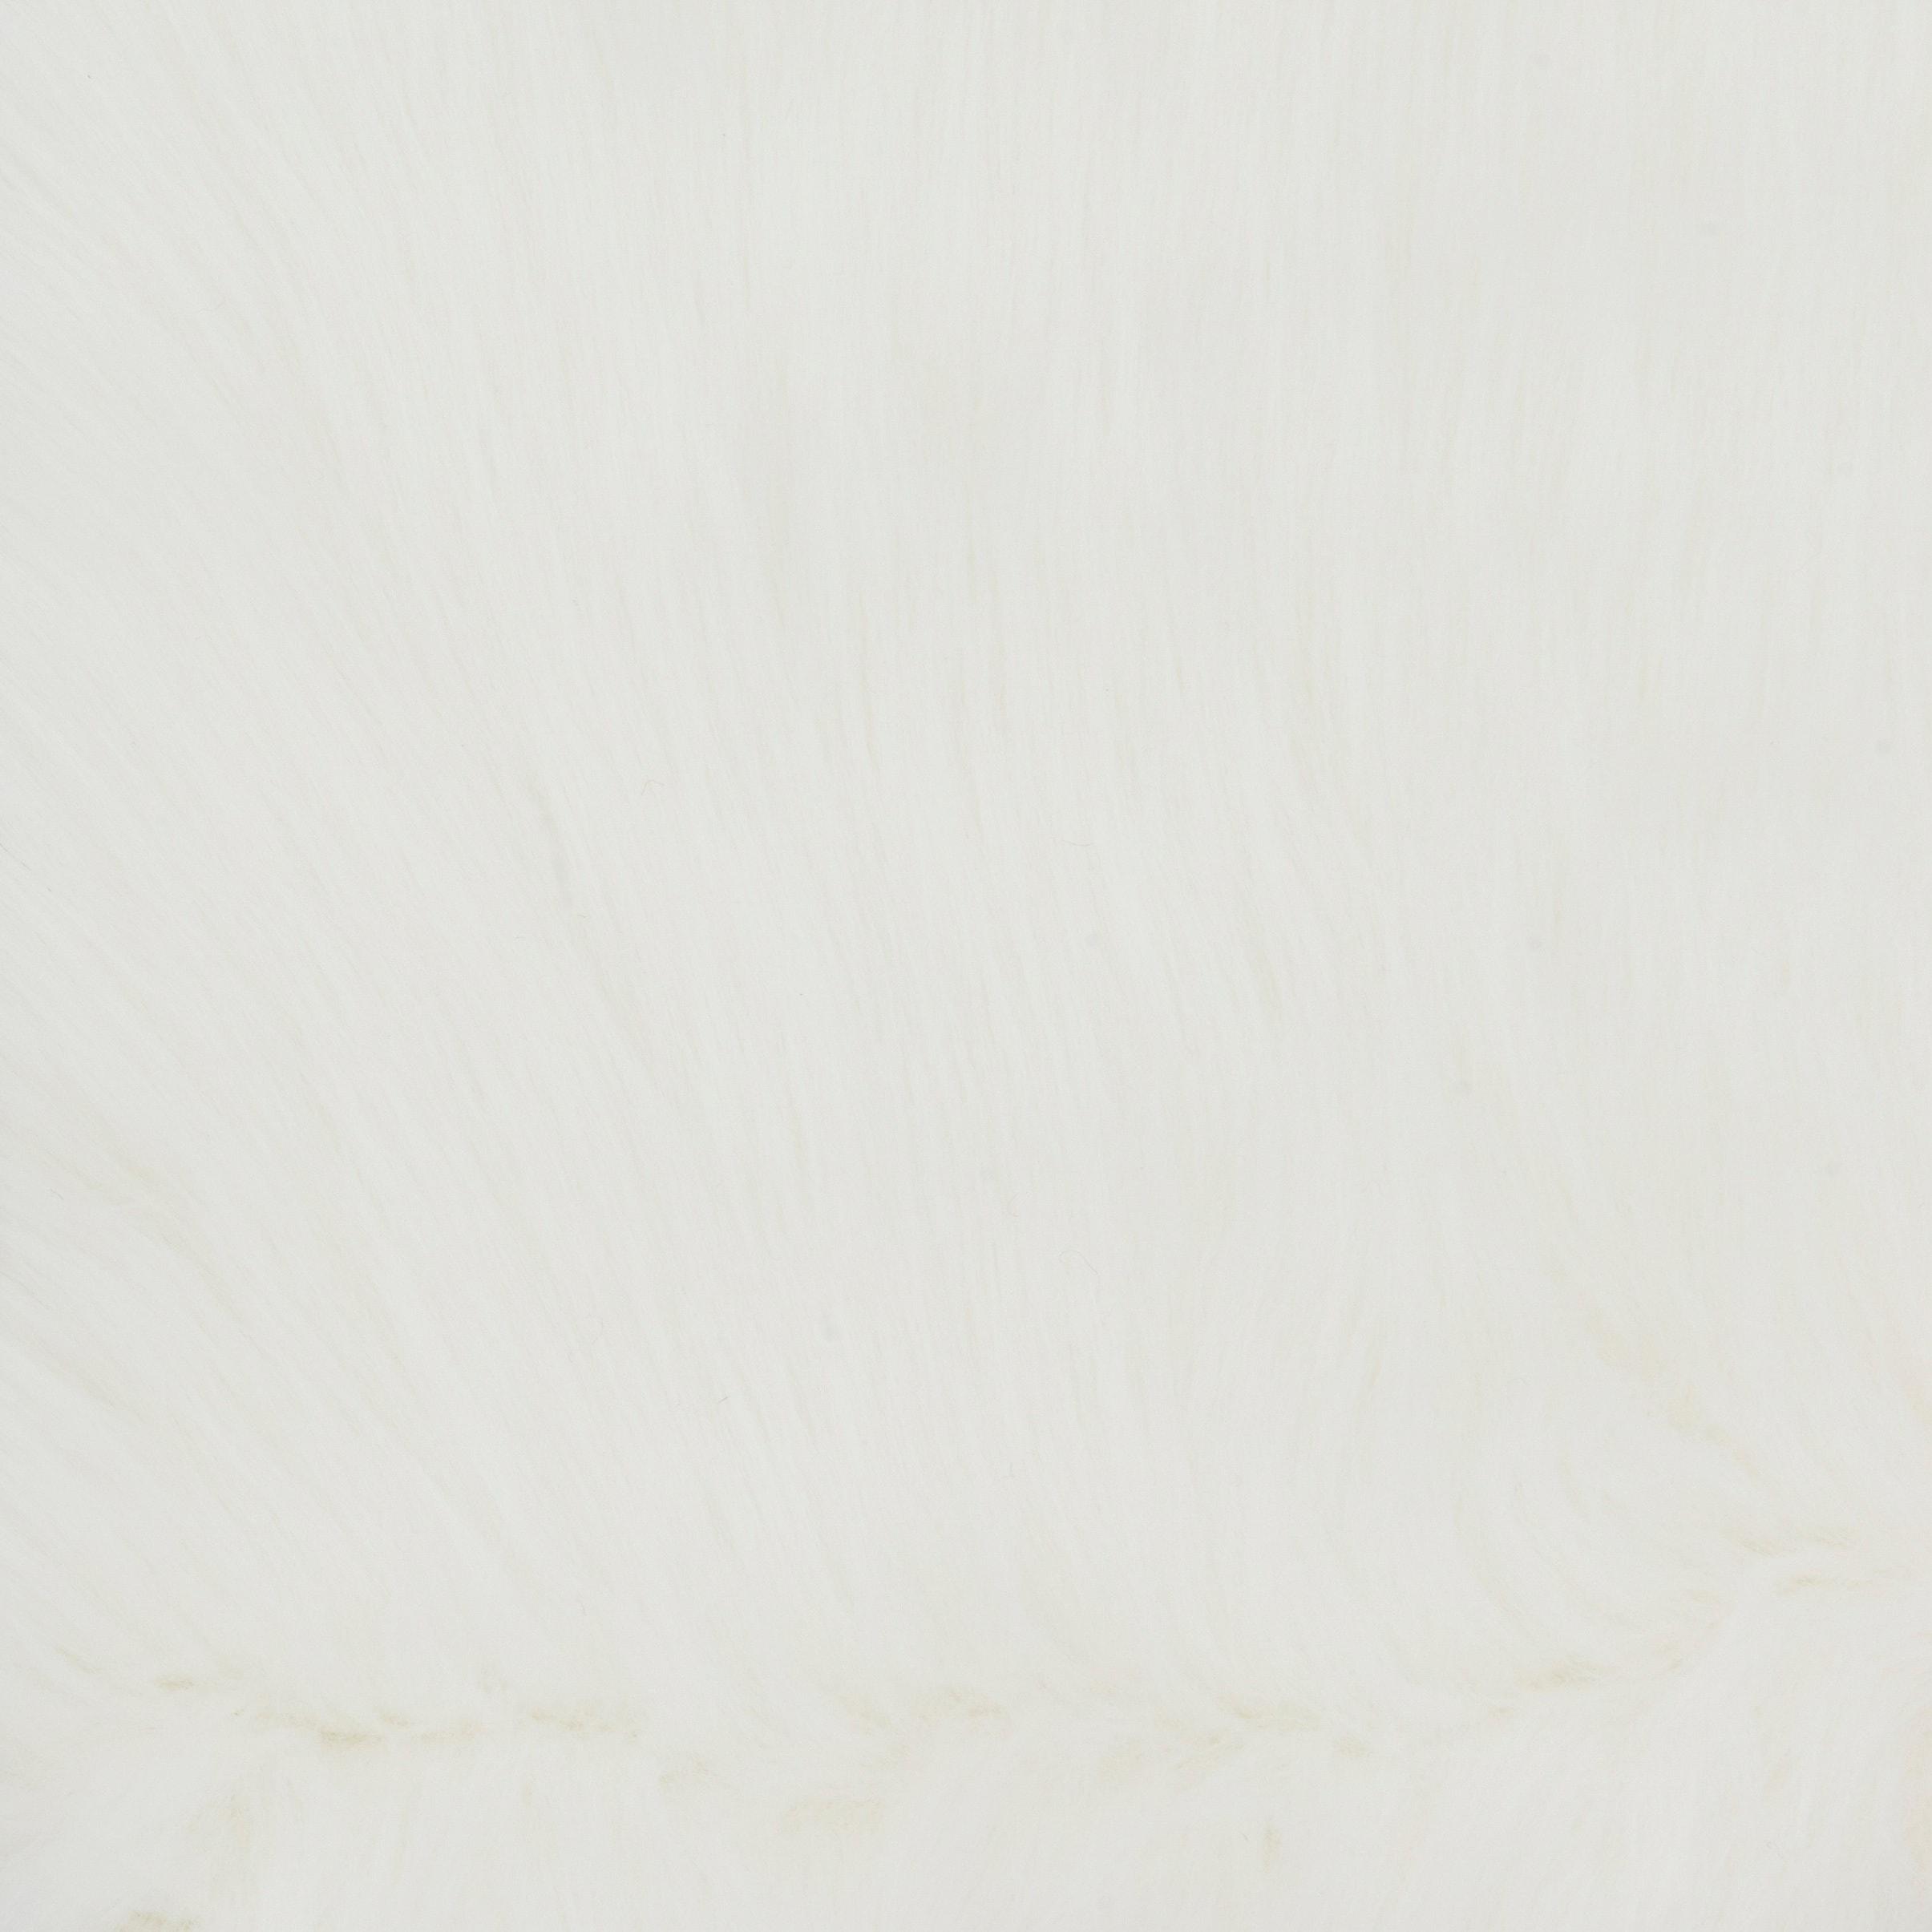 Faux Sheepskin Ivory White Shag Area Rug 5 x 76 Free Shipping